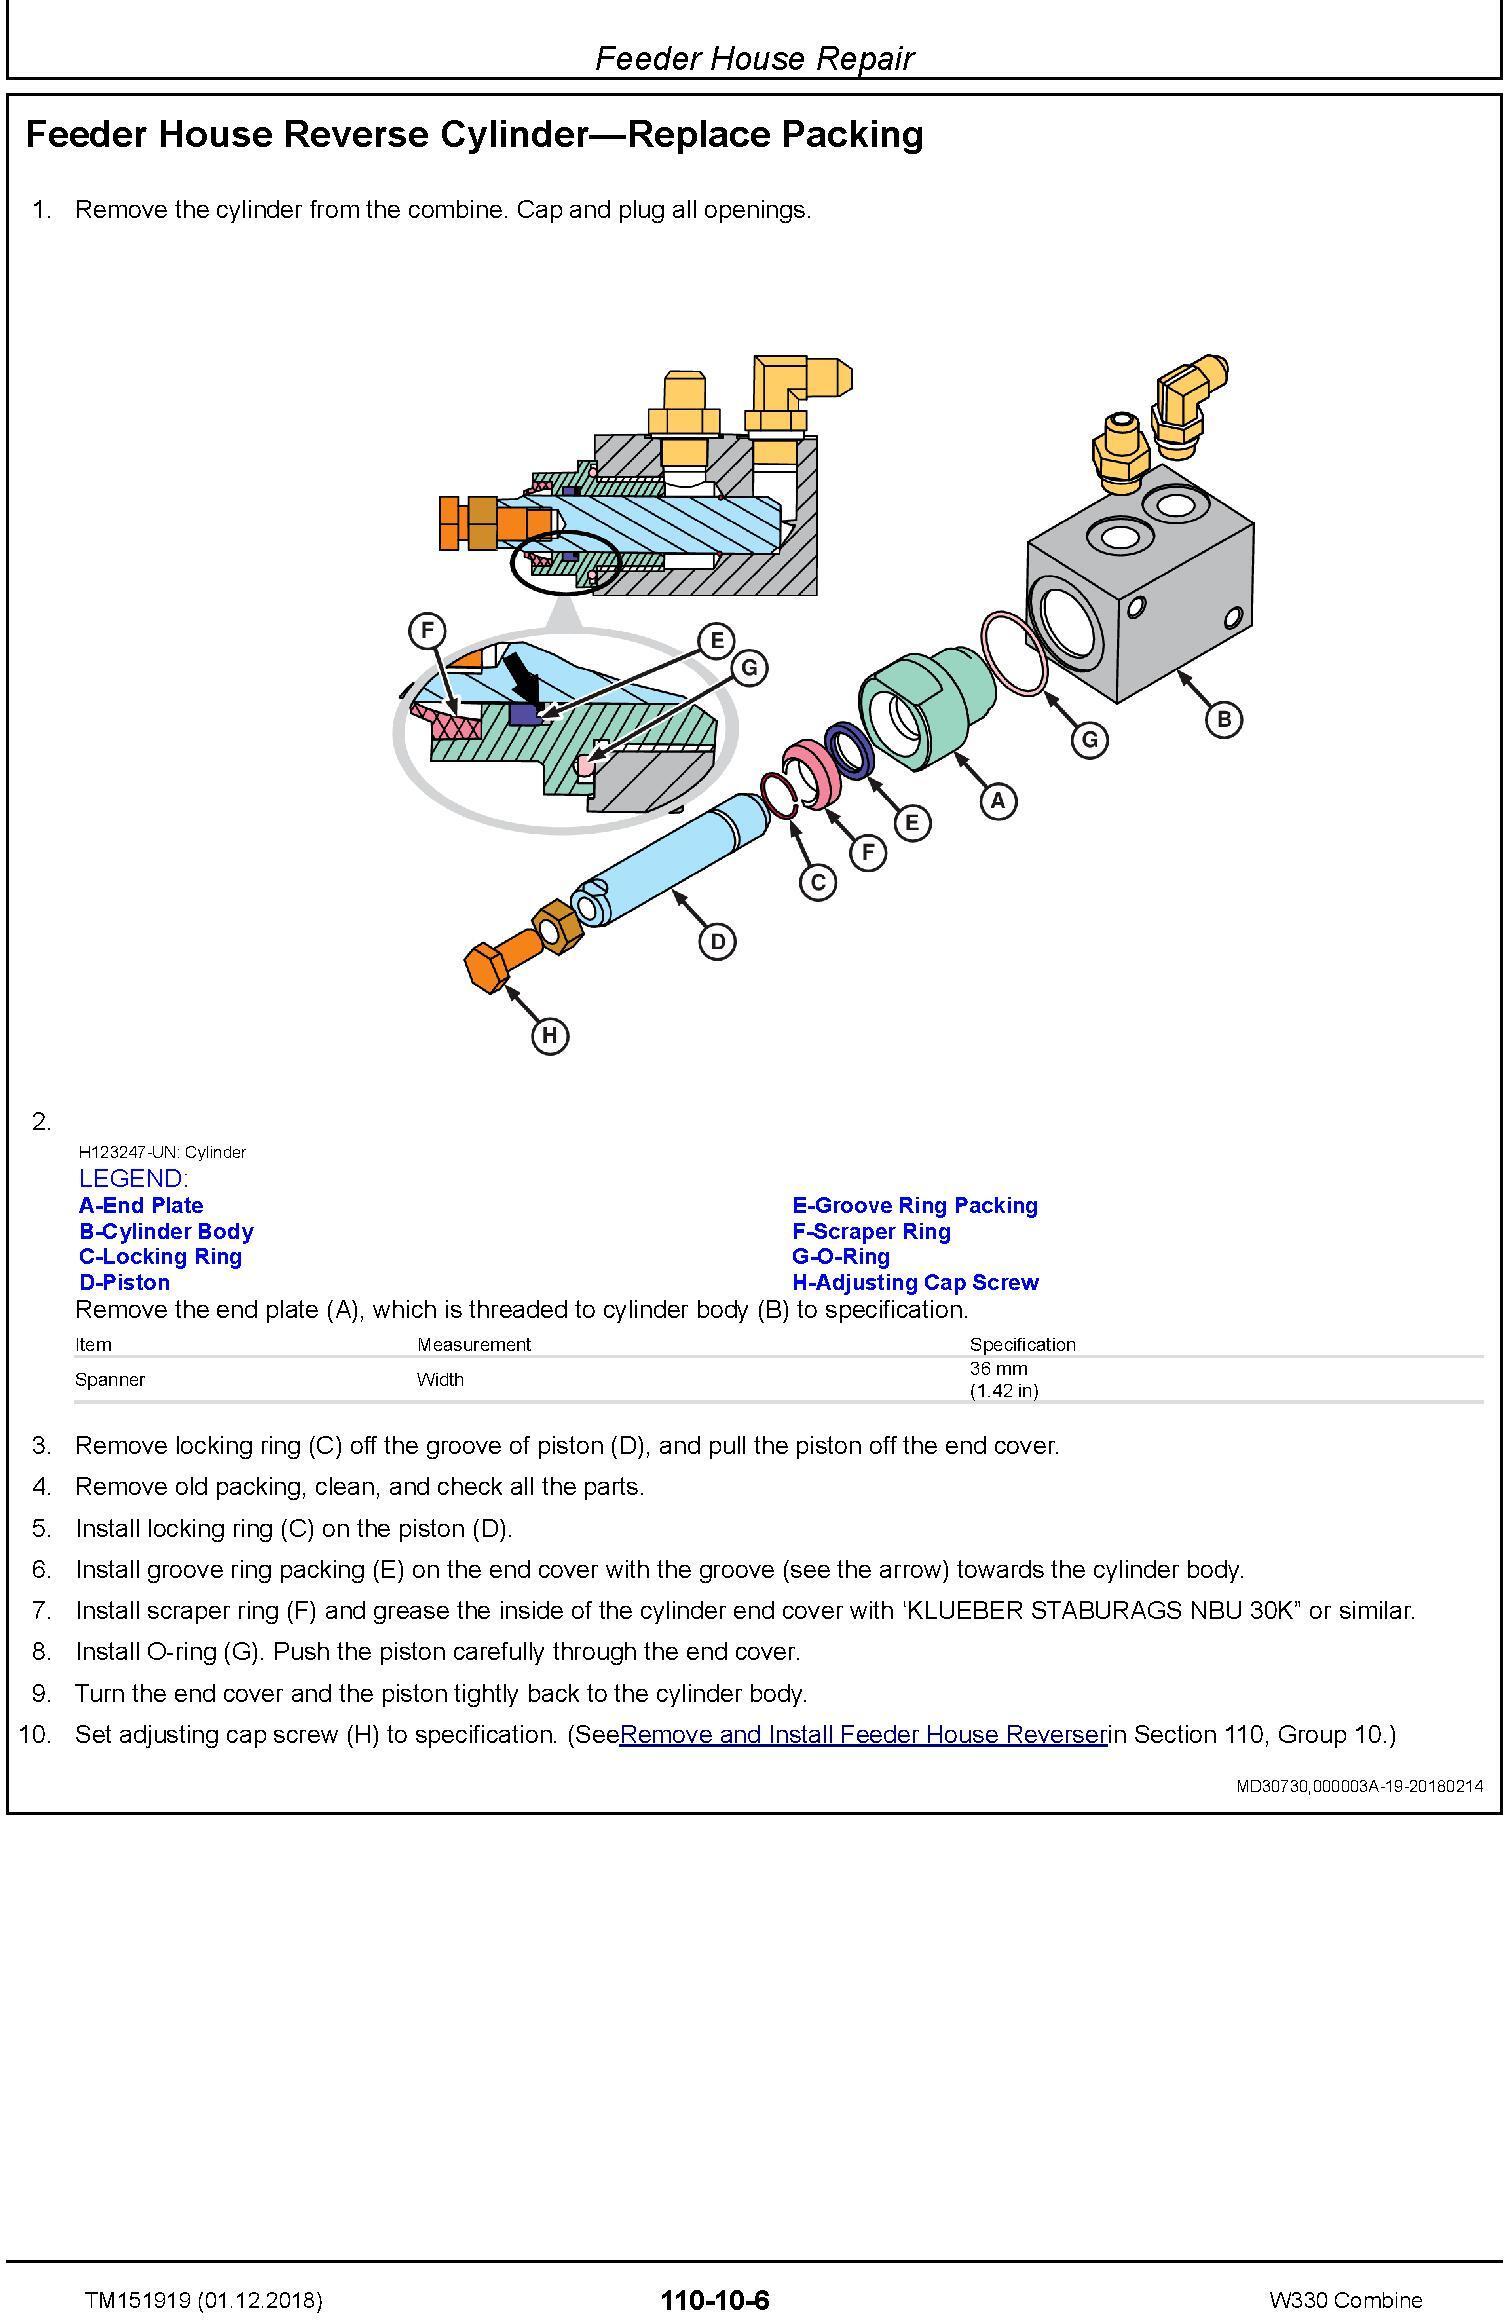 John Deere W330 Combine (SN.700949-) Repair Technical Service Manual (TM151919) - 3